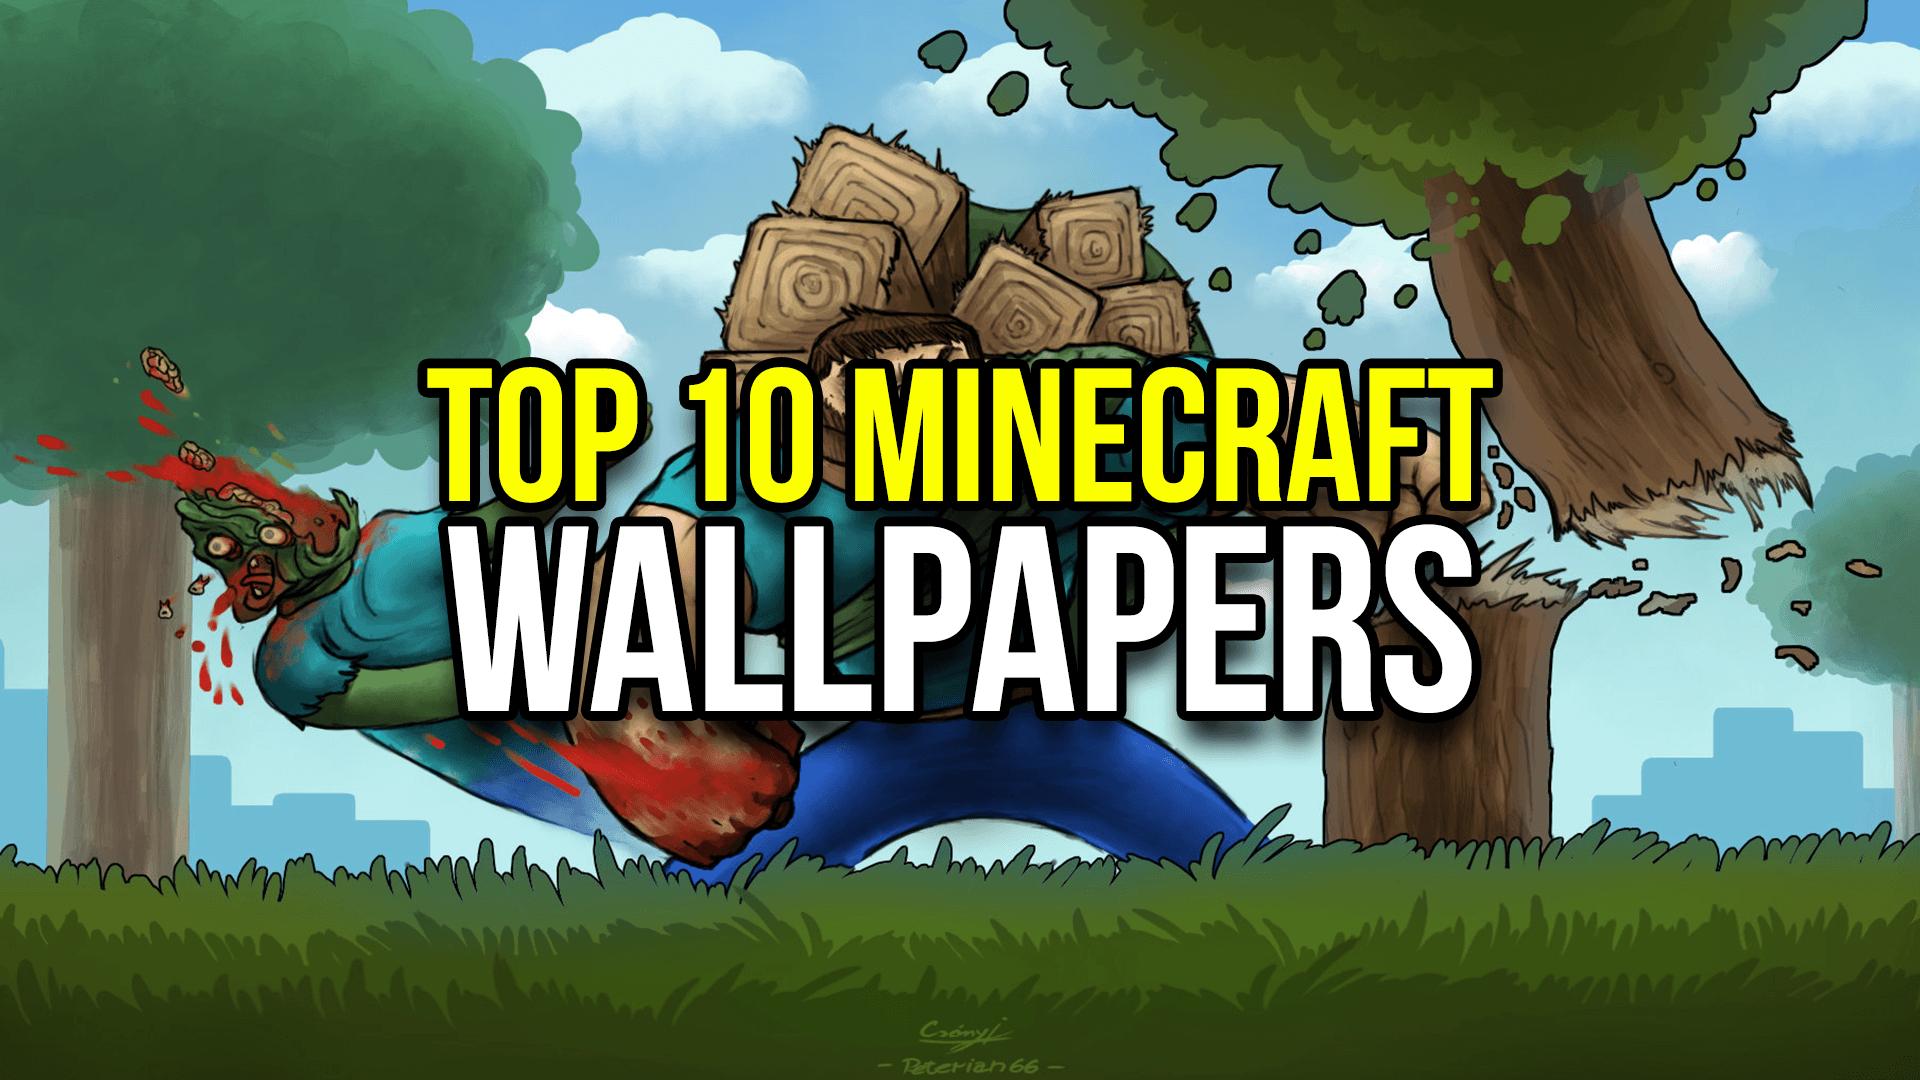 1920x1080 Top 10 Minecraft Wallpapers - MinecraftRocket